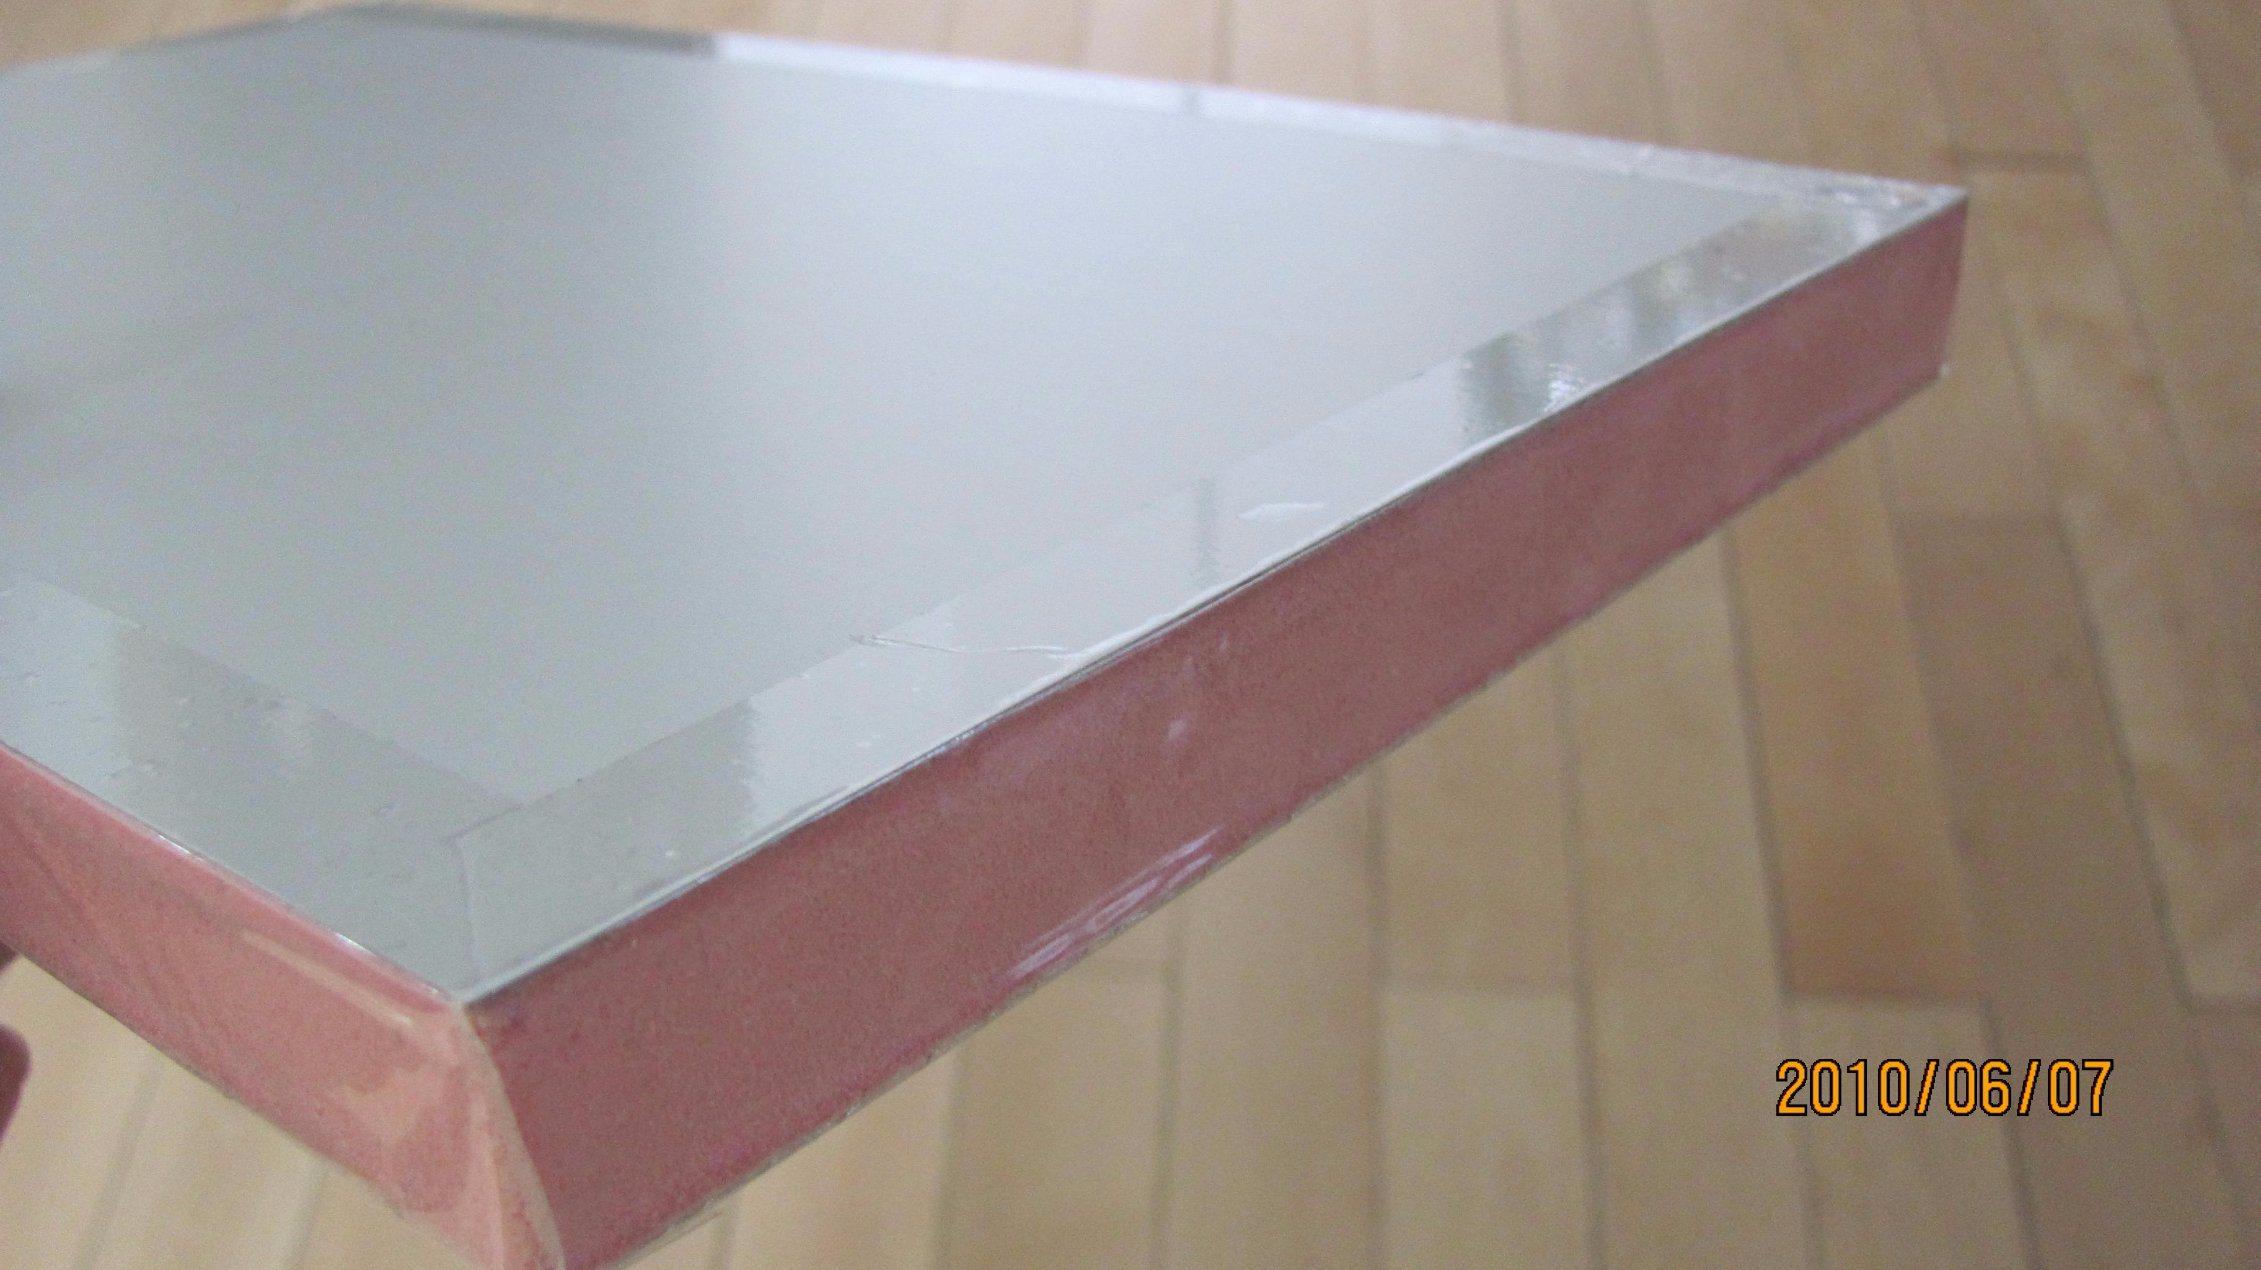 Pre-Insulated Phenolic Foam Air Duct Panel